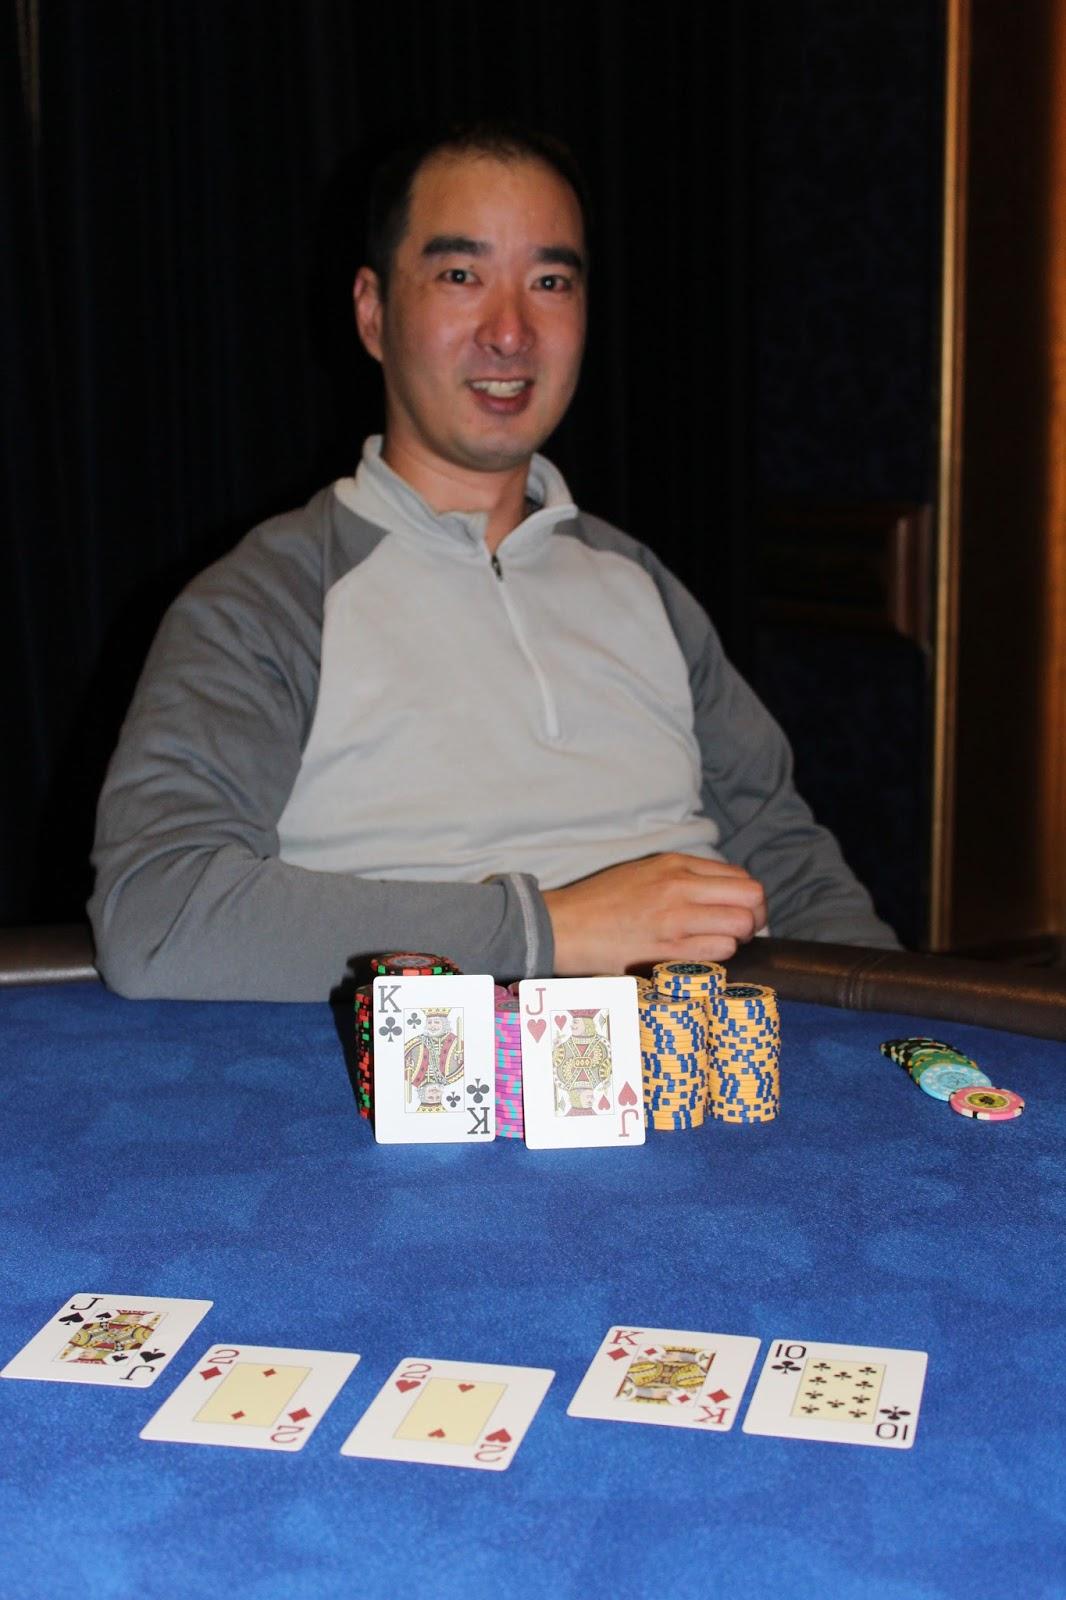 Dunedin Casino, Poker, Weekly Wednesday, 6-Max, Texas Hold'em, Tournament